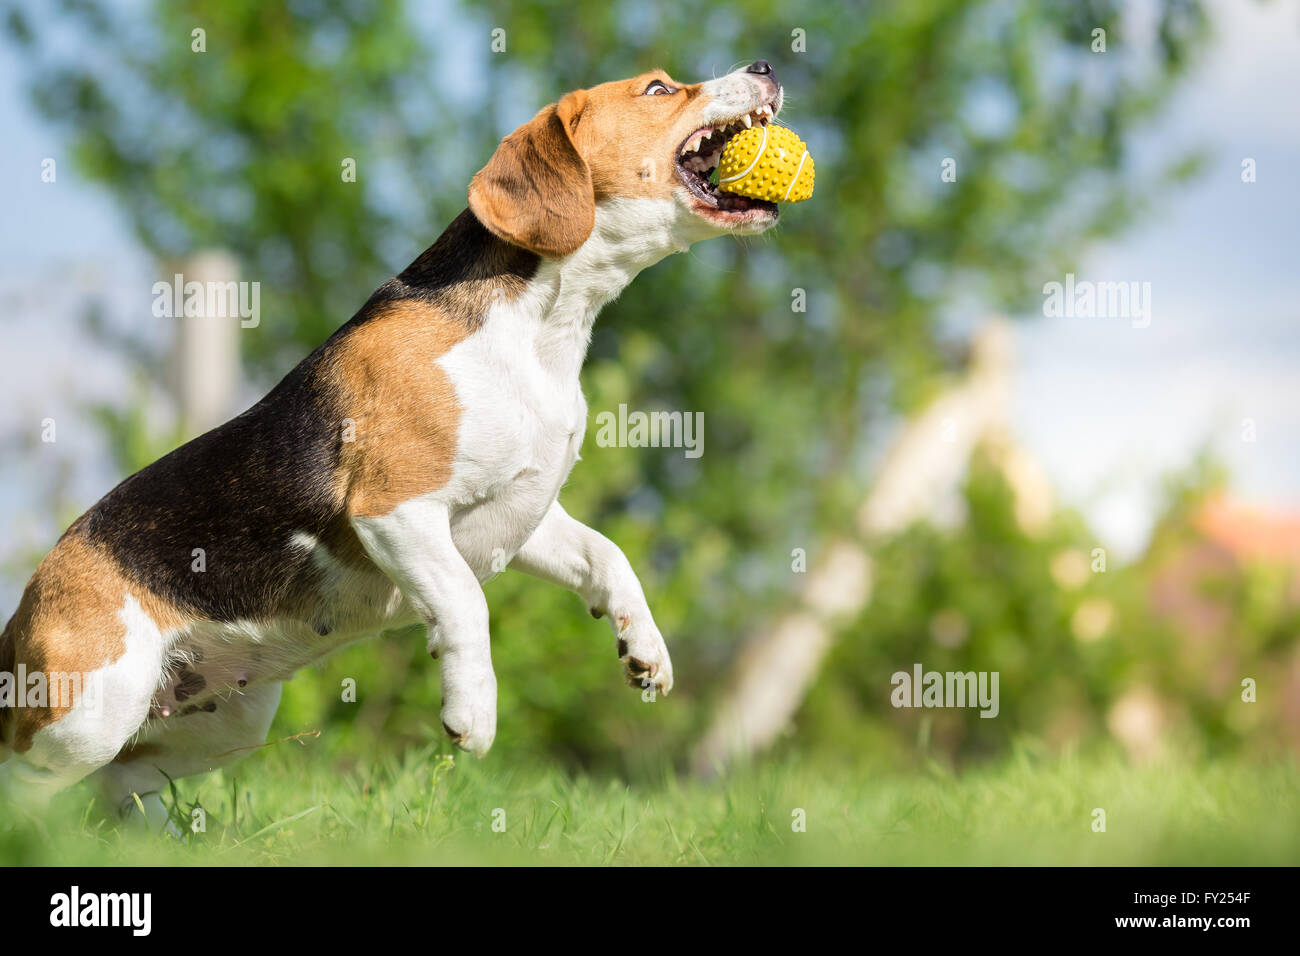 Beagle dog catching a ball - Stock Image